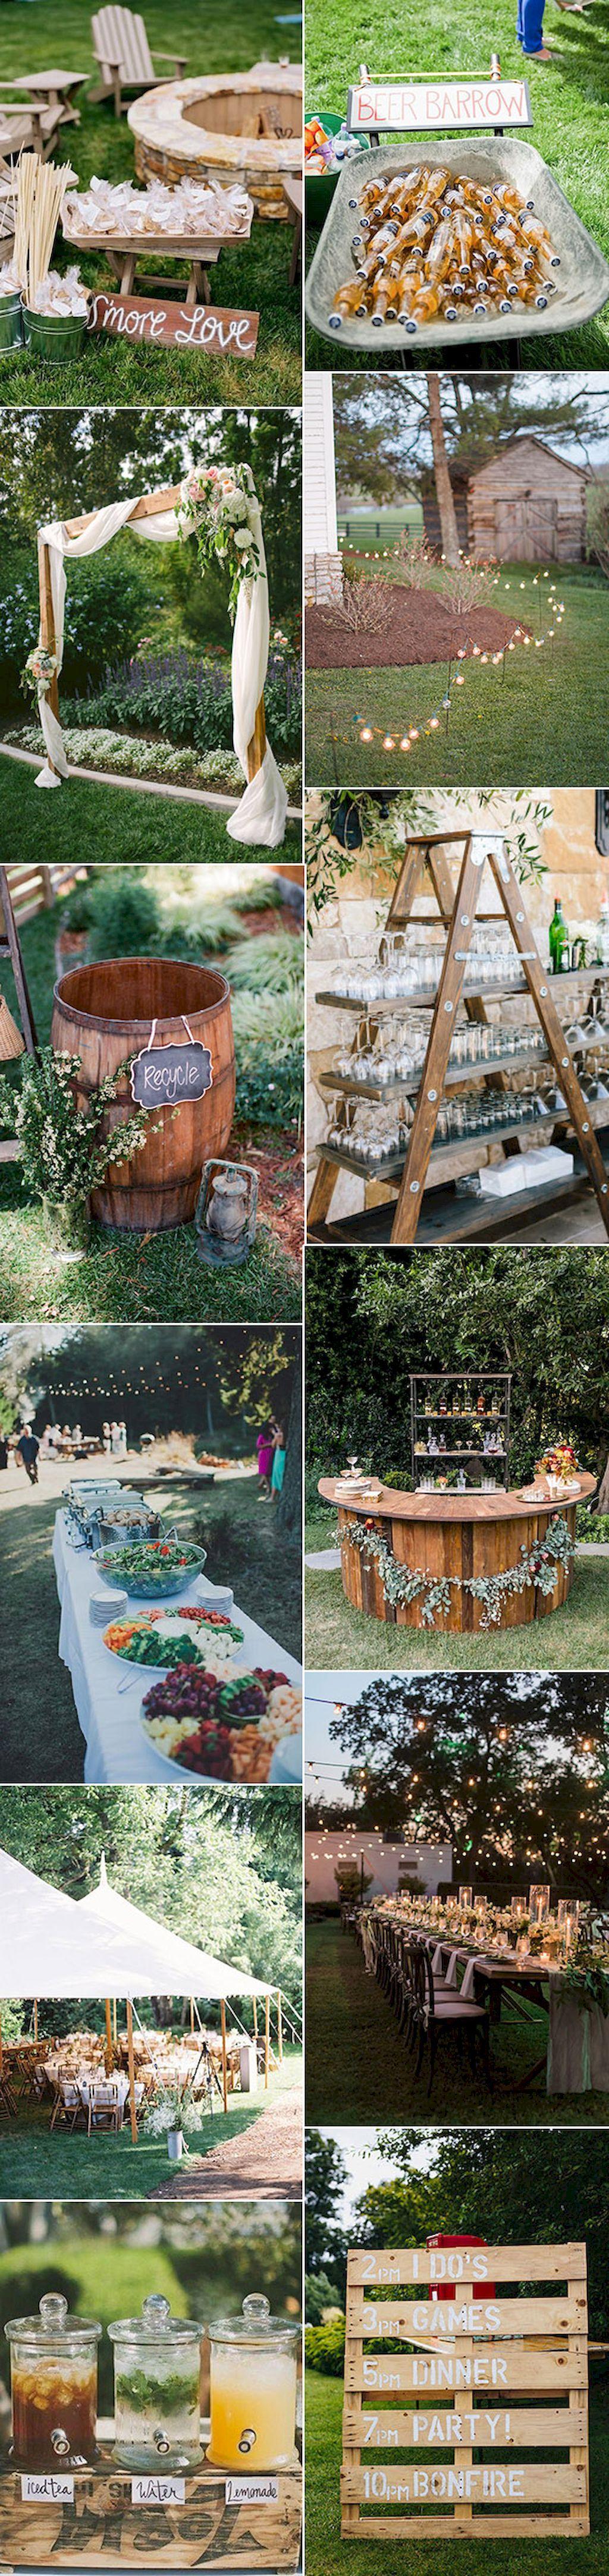 adorable 48 elegant outdoor wedding decor ideas on a budget https